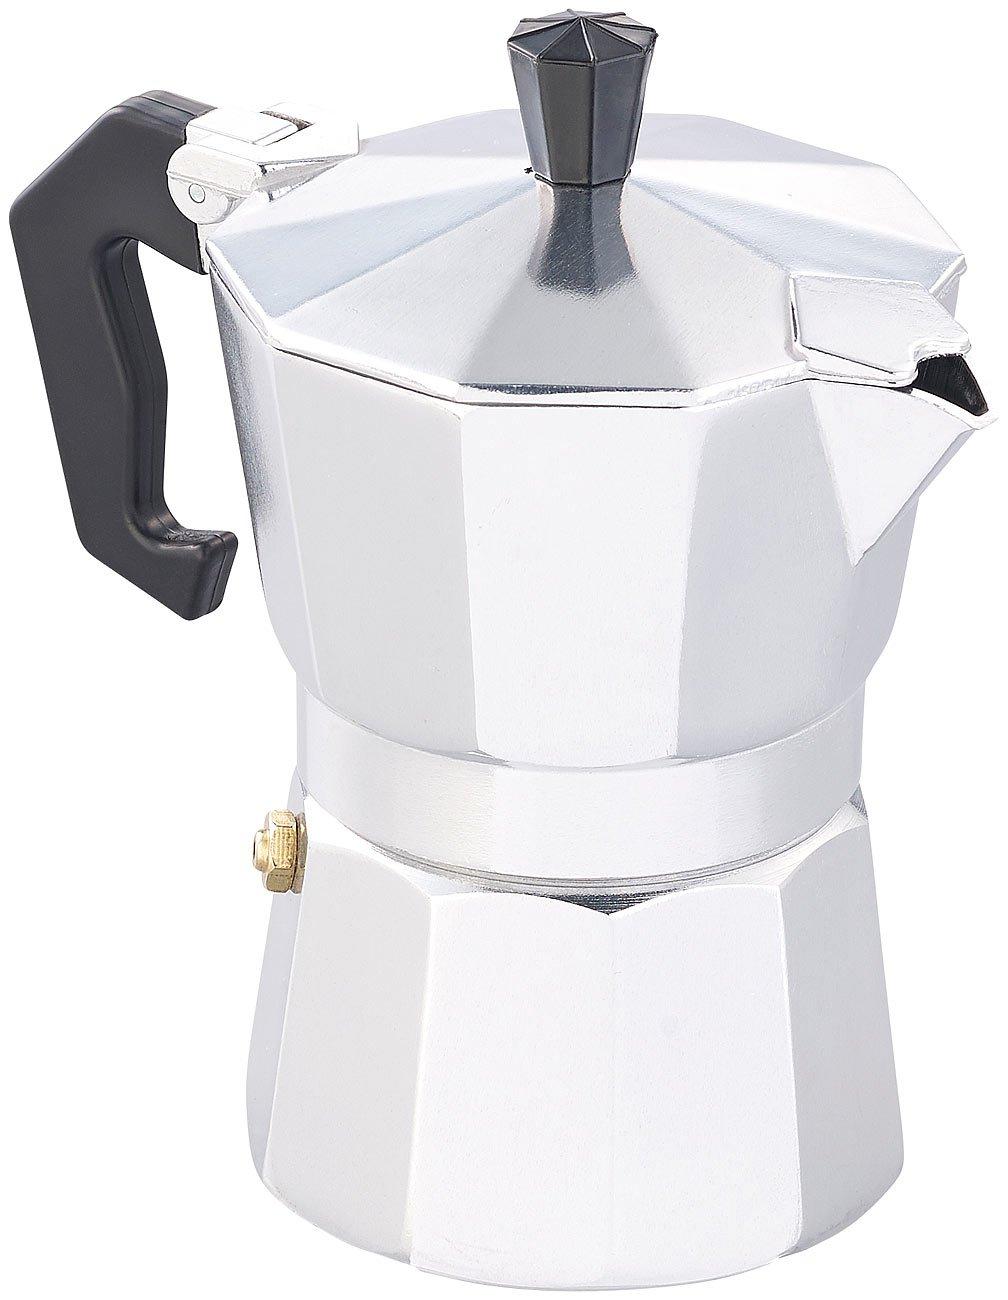 Cucina di Modena Espresso de eléctrica para 3 tazas, para ...